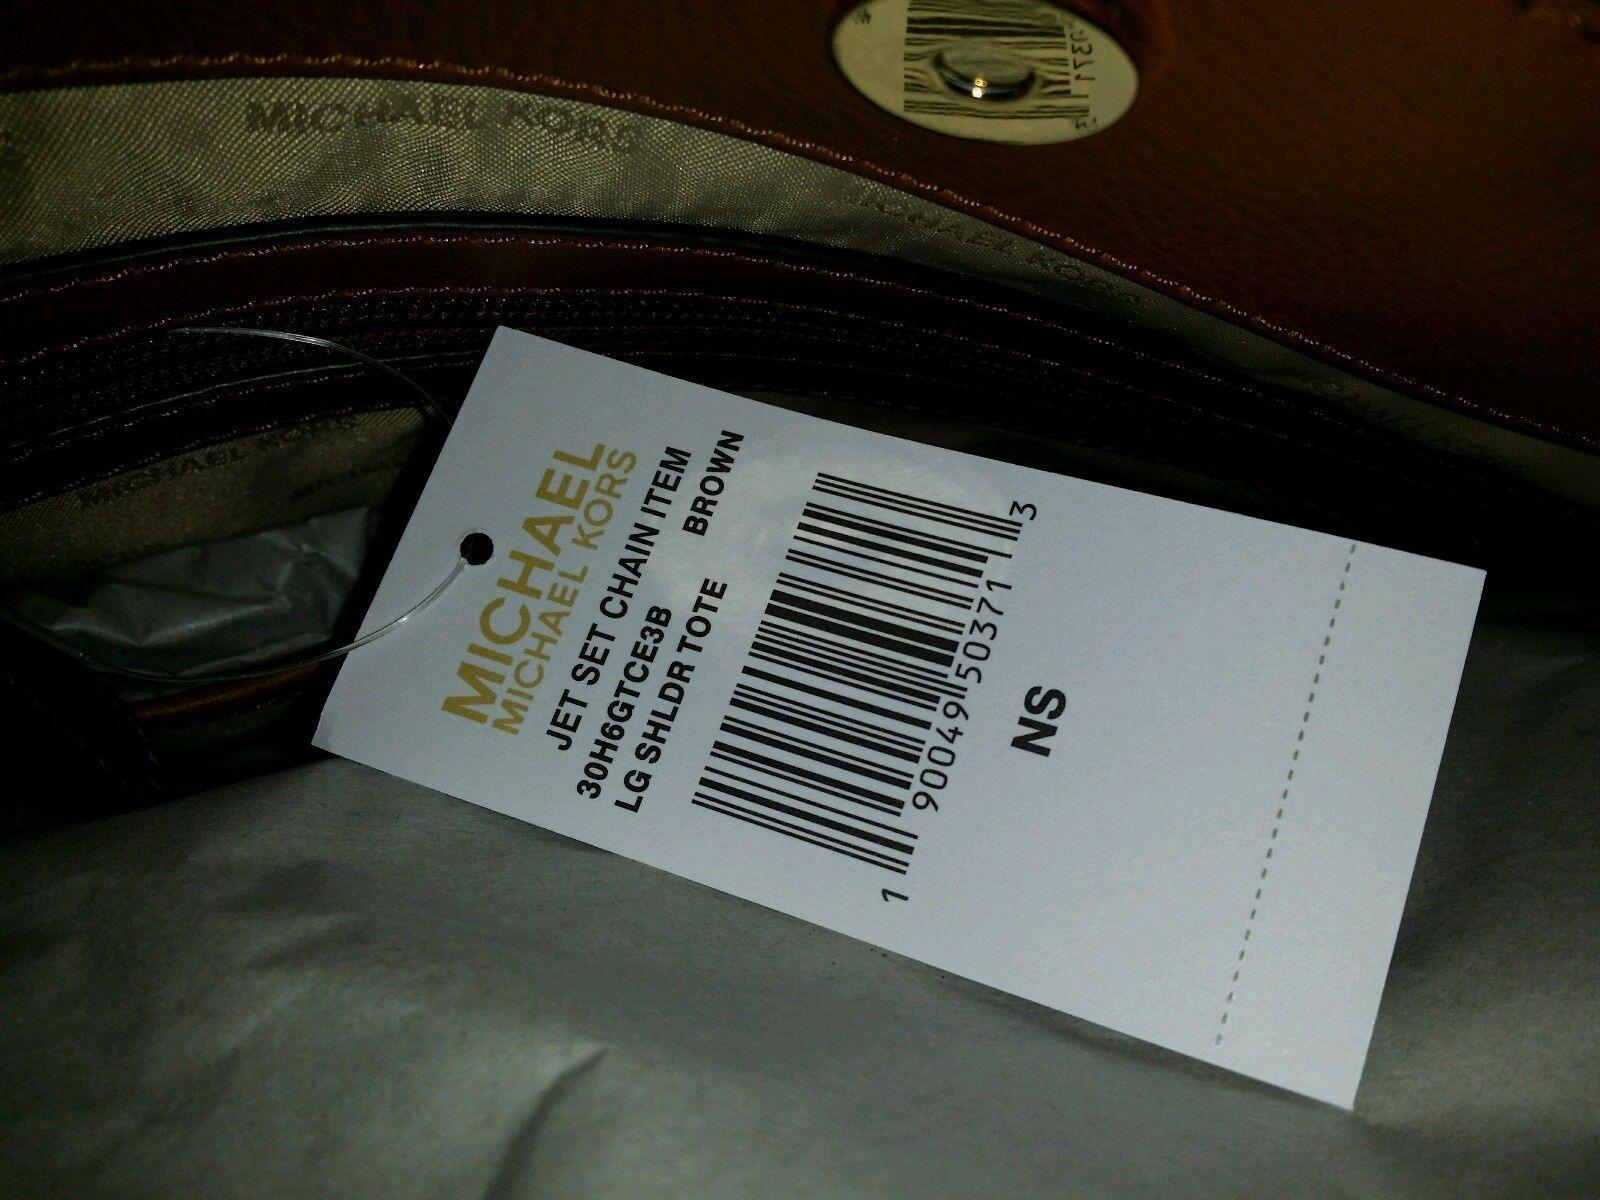 NWT MICHAEL KORS Jet Set Chain Large PVC Leather Shoulder Tote Bag Brown $298